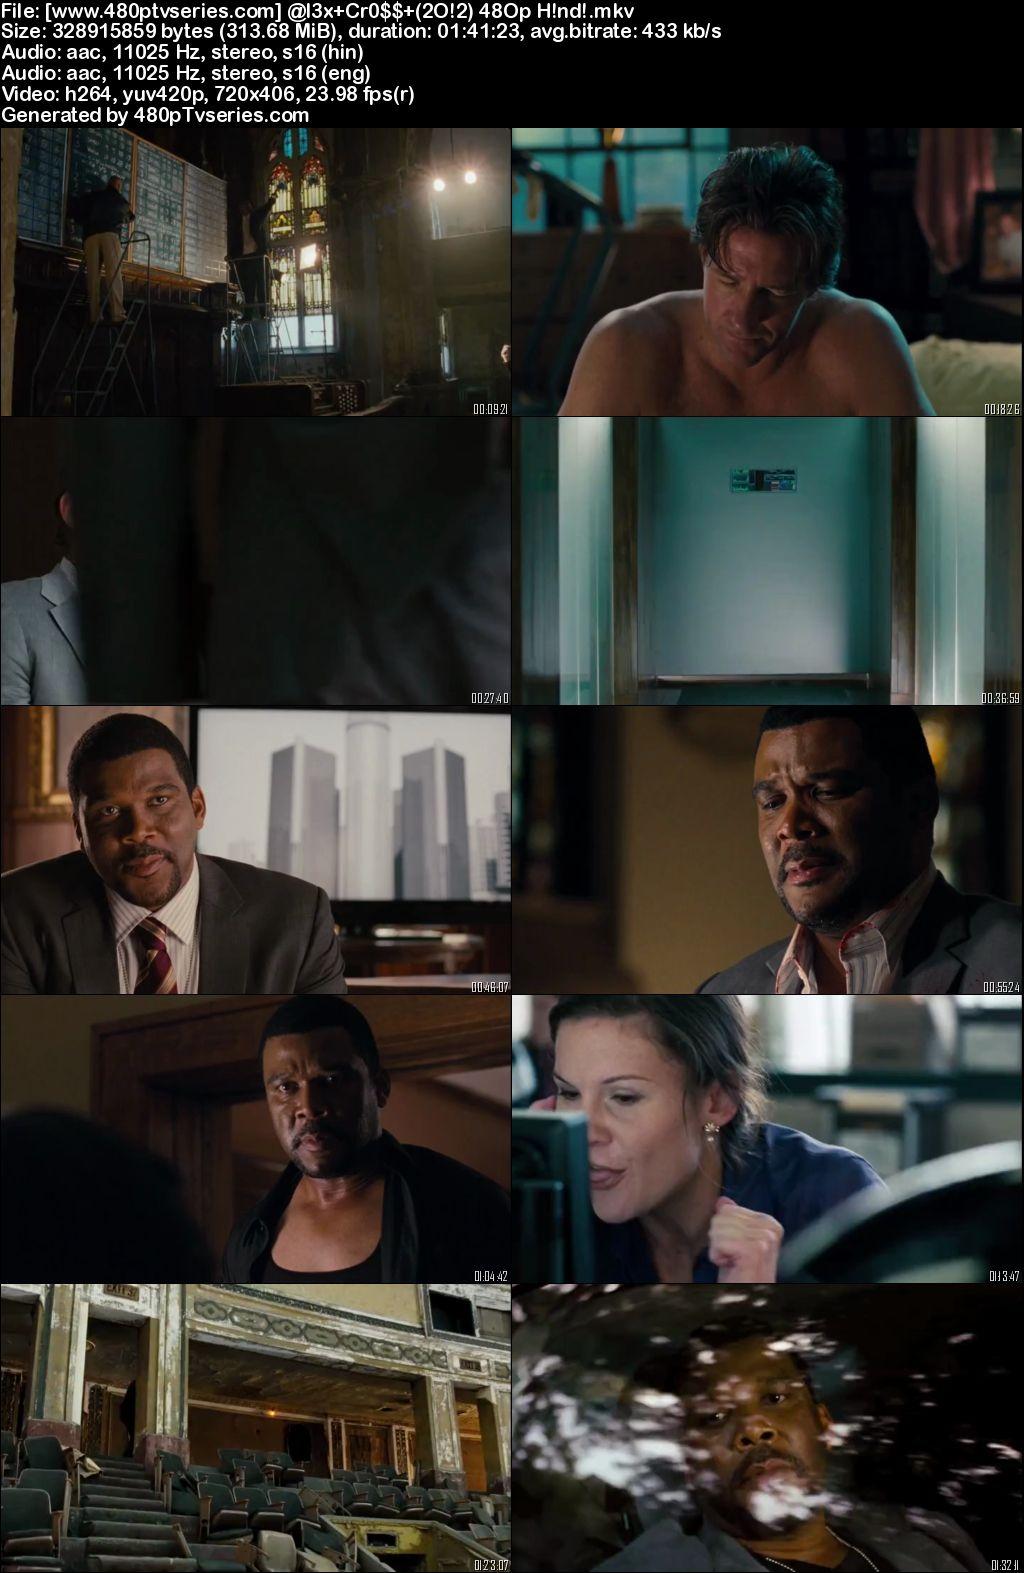 Alex Cross (2012) 300MB Full Hindi Dual Audio Movie Download 480p Bluray Free Watch Online Full Movie Download Worldfree4u 9xmovies